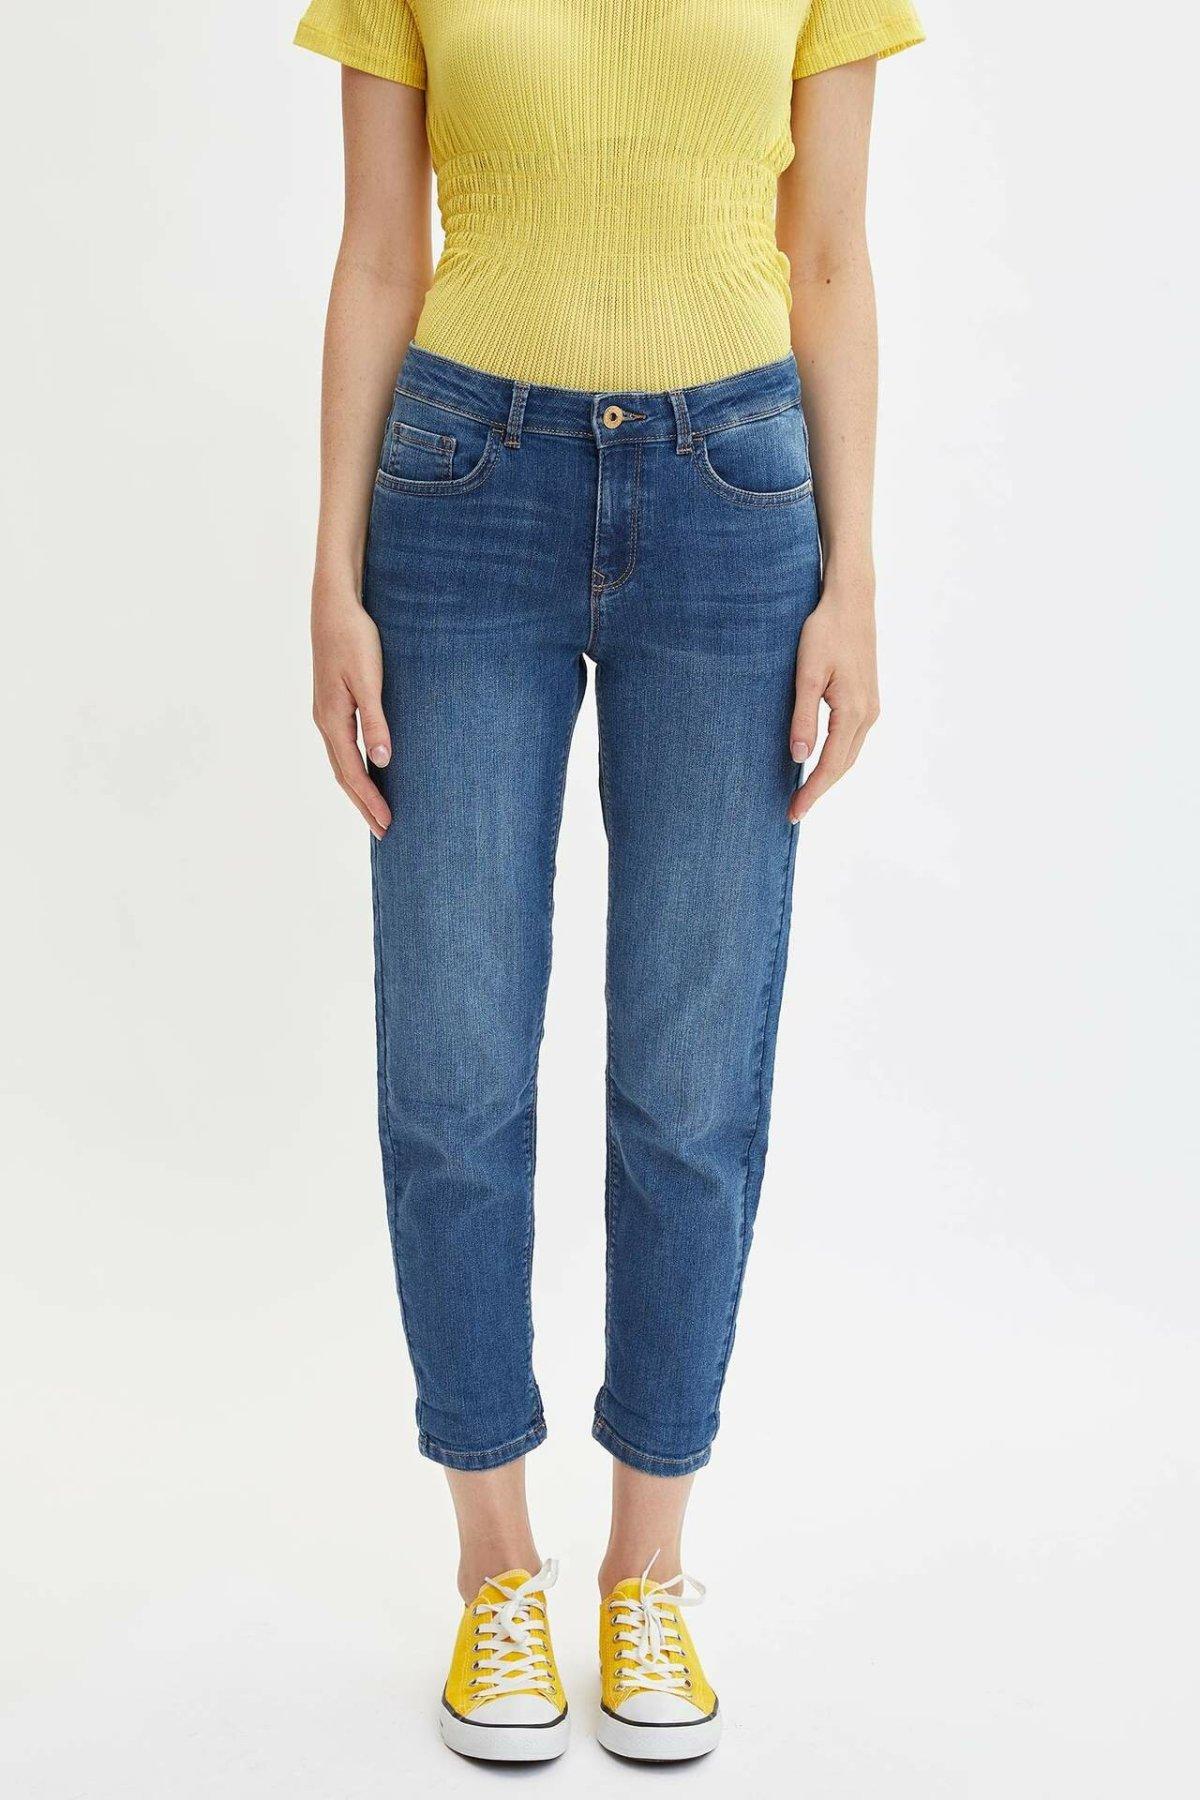 Defact Blue Lady Mid-Cintura suelta Denim Jeans Simple Joker nueve minutos pantalones pitillo casual-J0835AZ19AU